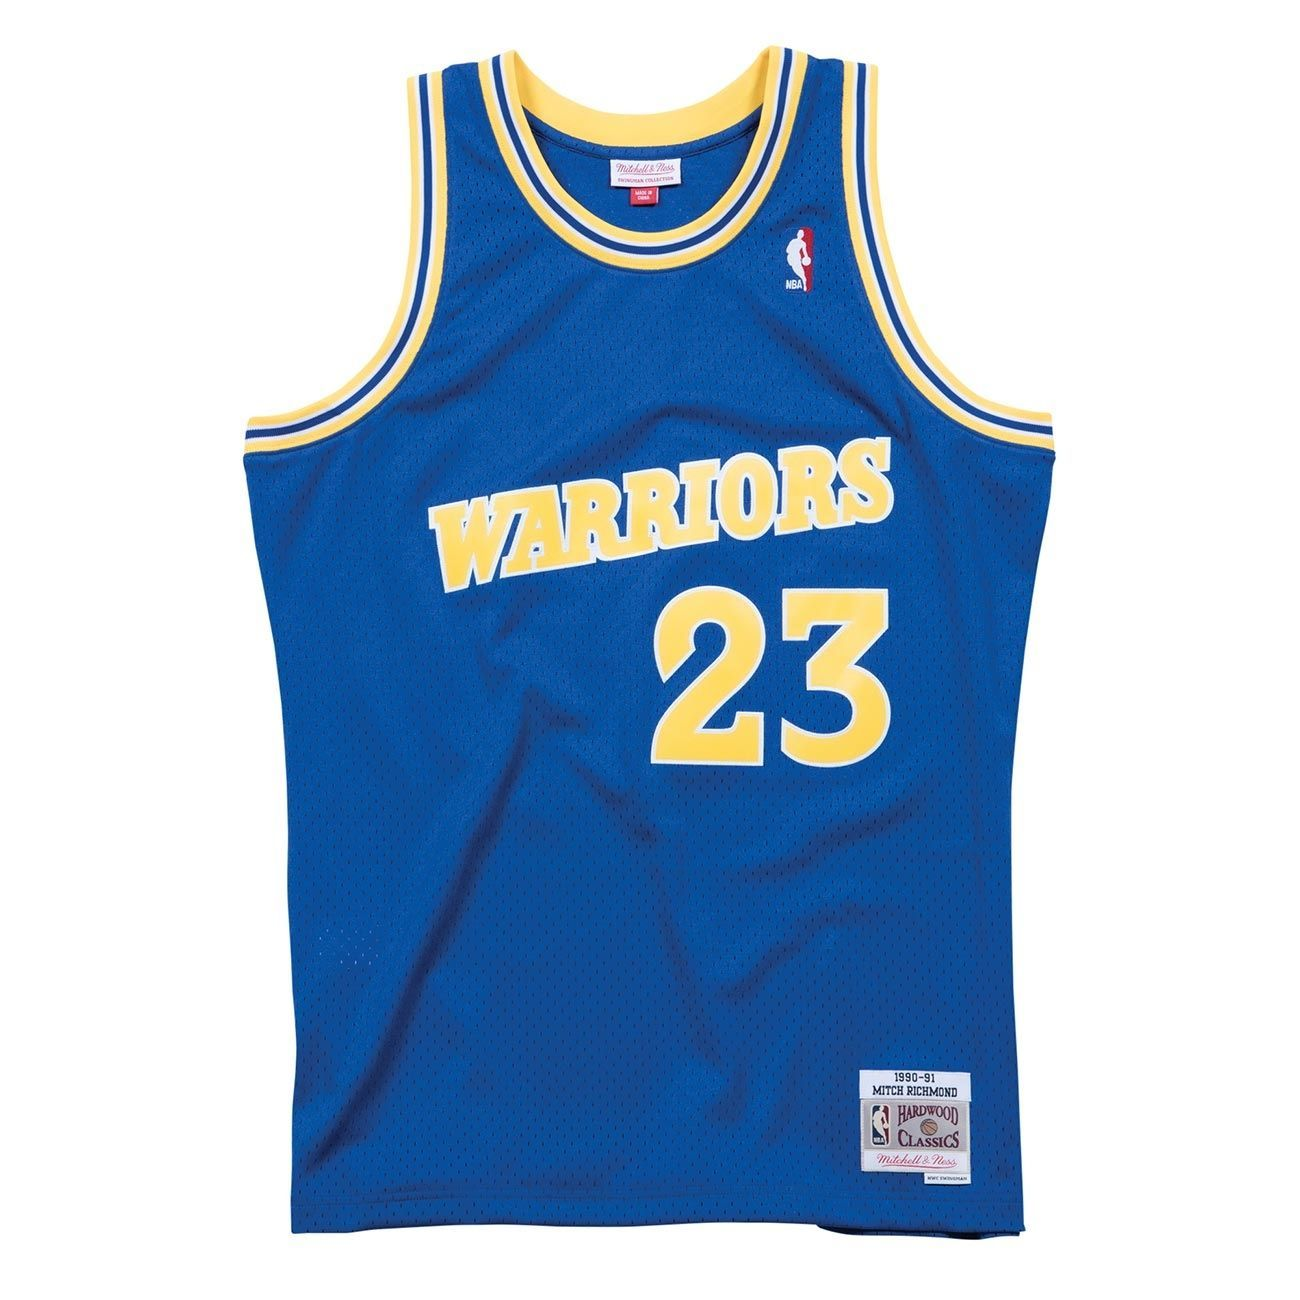 e697dda1b11 Mitchell   Ness Mitch Richmond  23 Golden State Warriors 1990-91 Swingman  NBA Jersey Blue